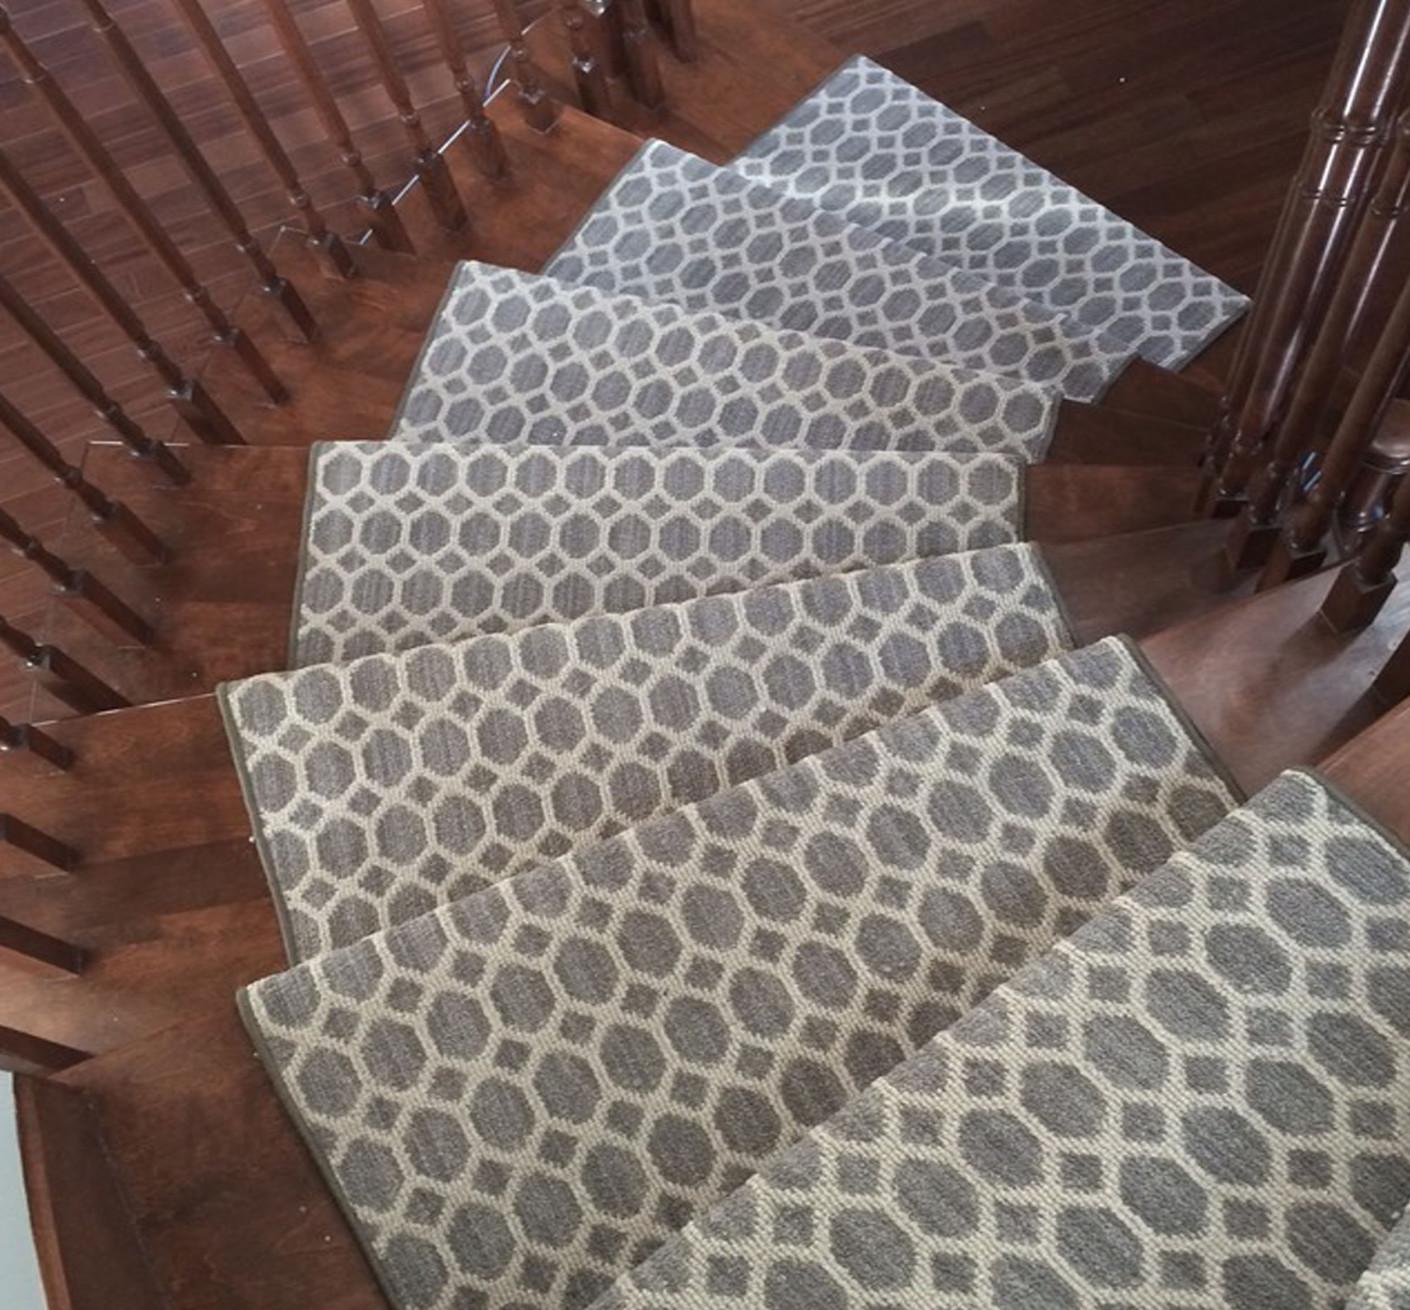 Modern Berber Carpet for Stairs in Toronto